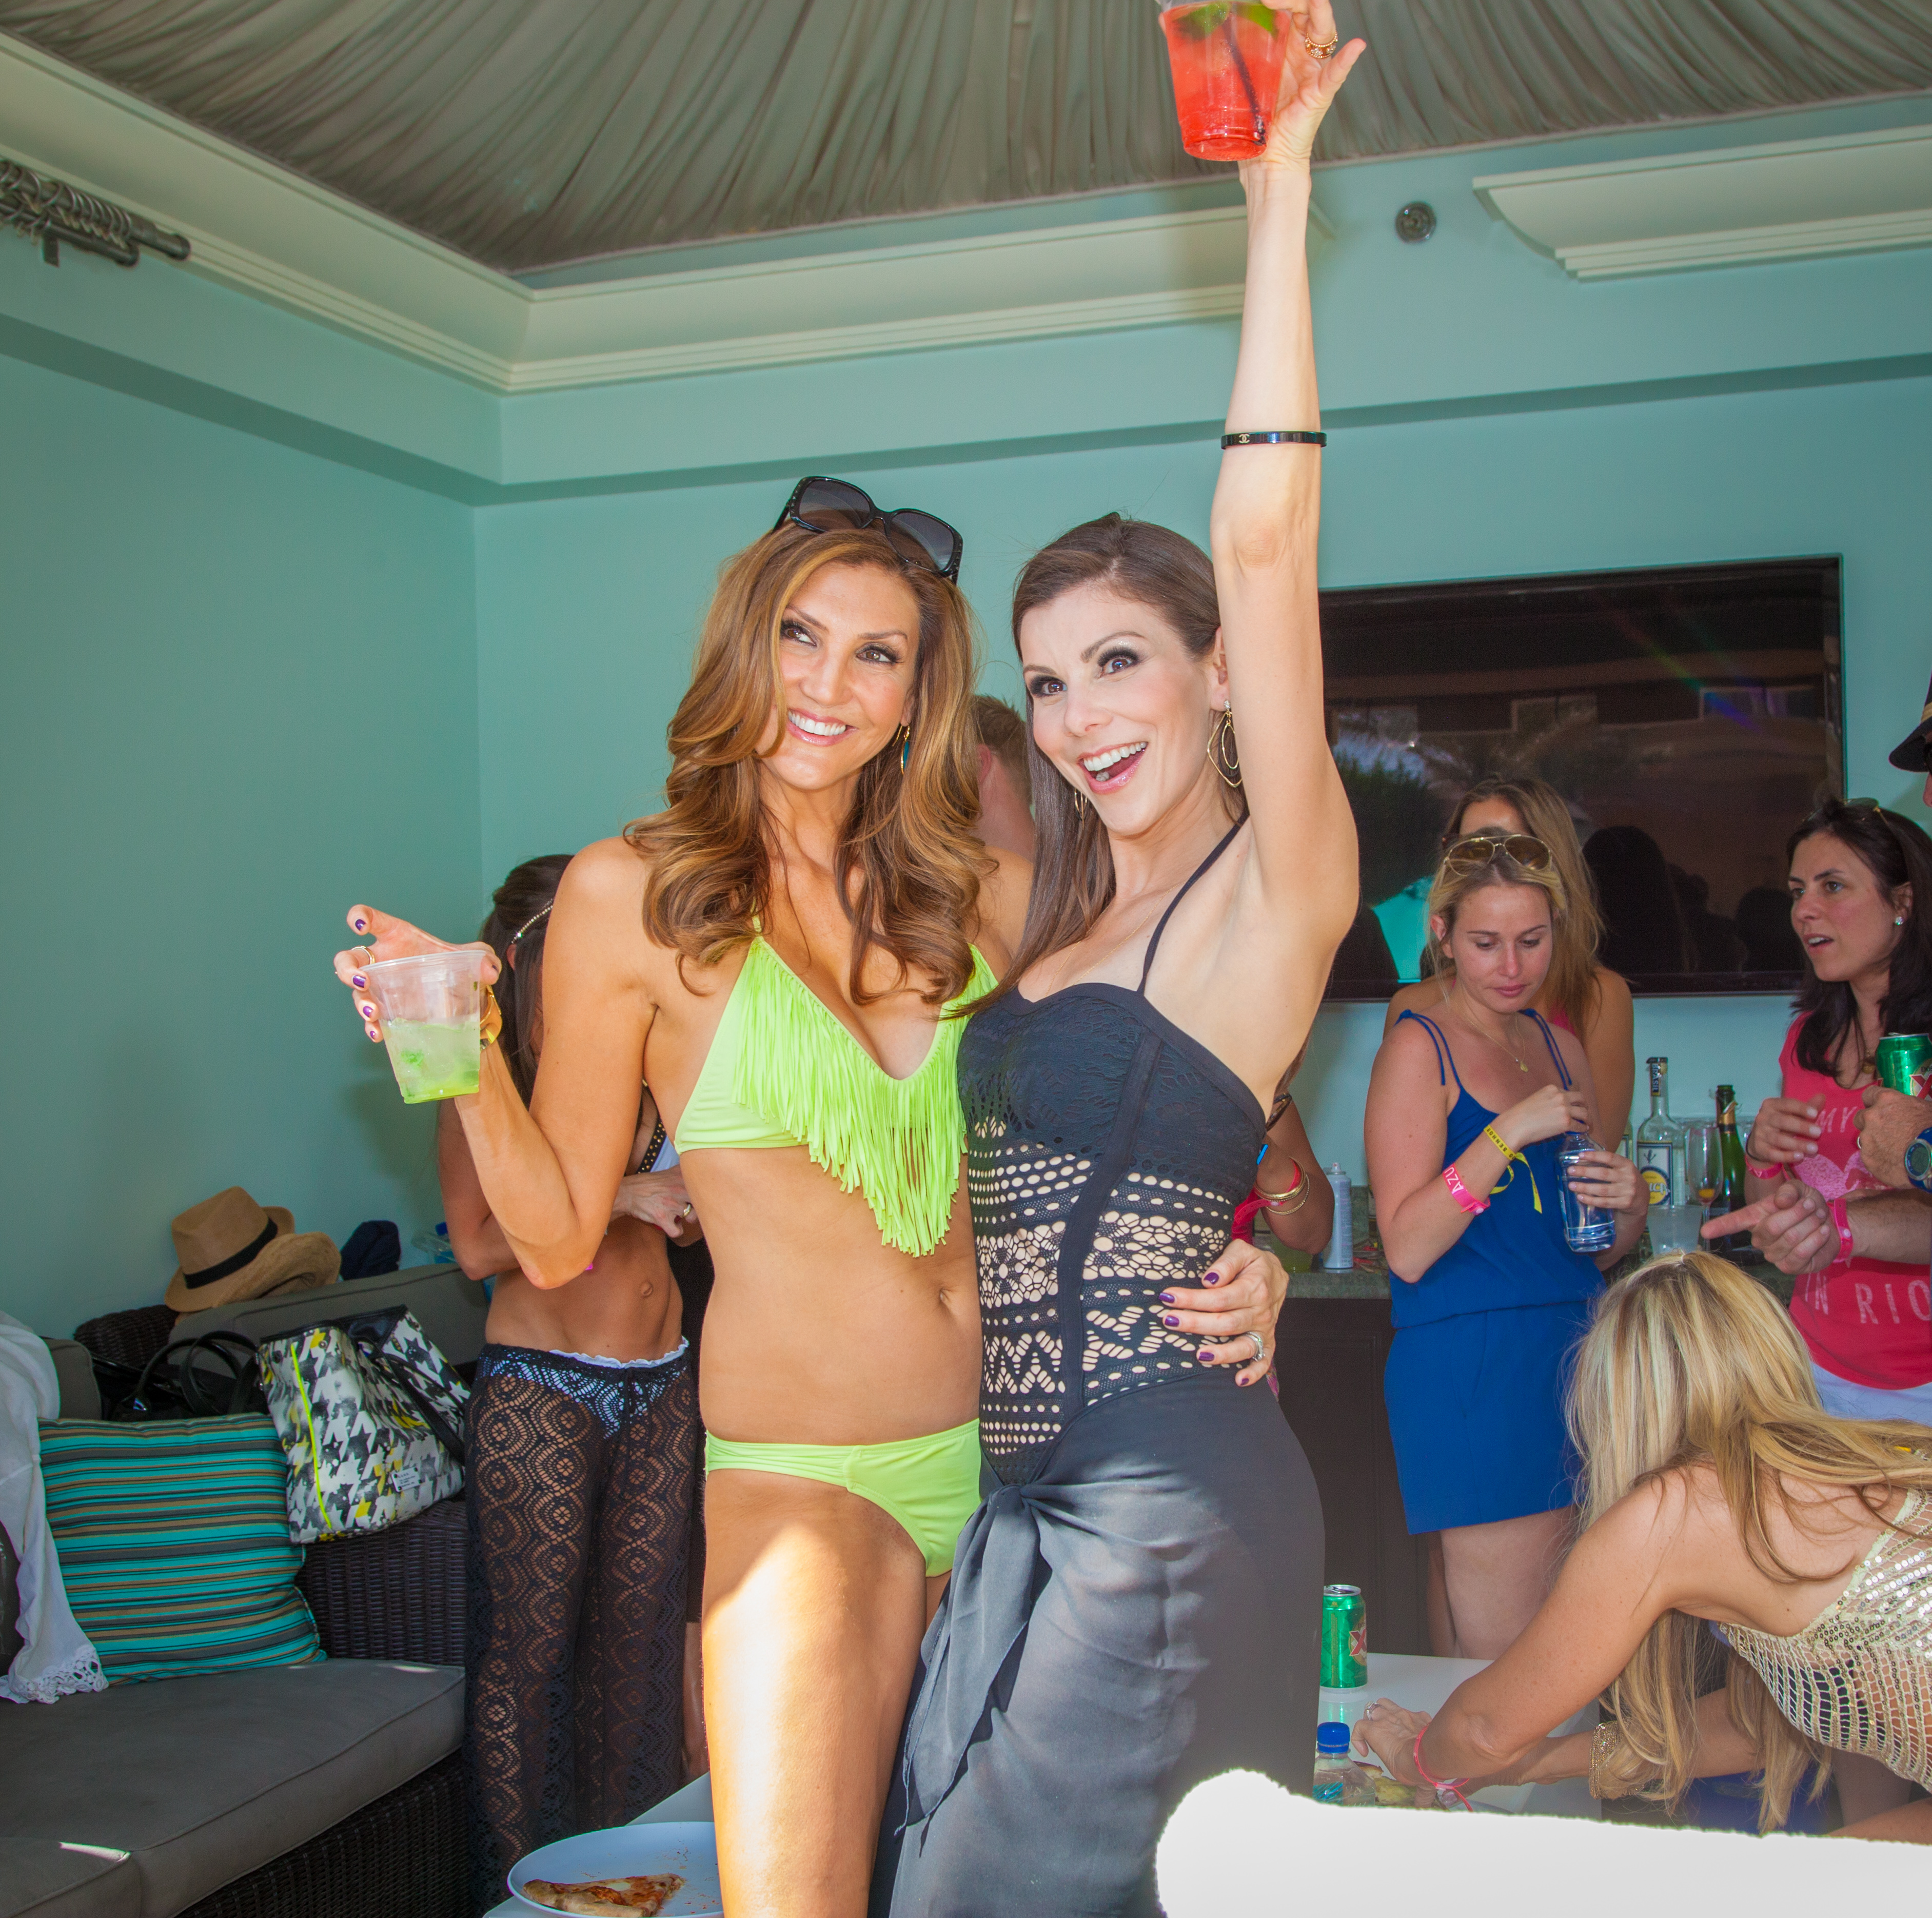 Heather McDonald & Heather Dubrow